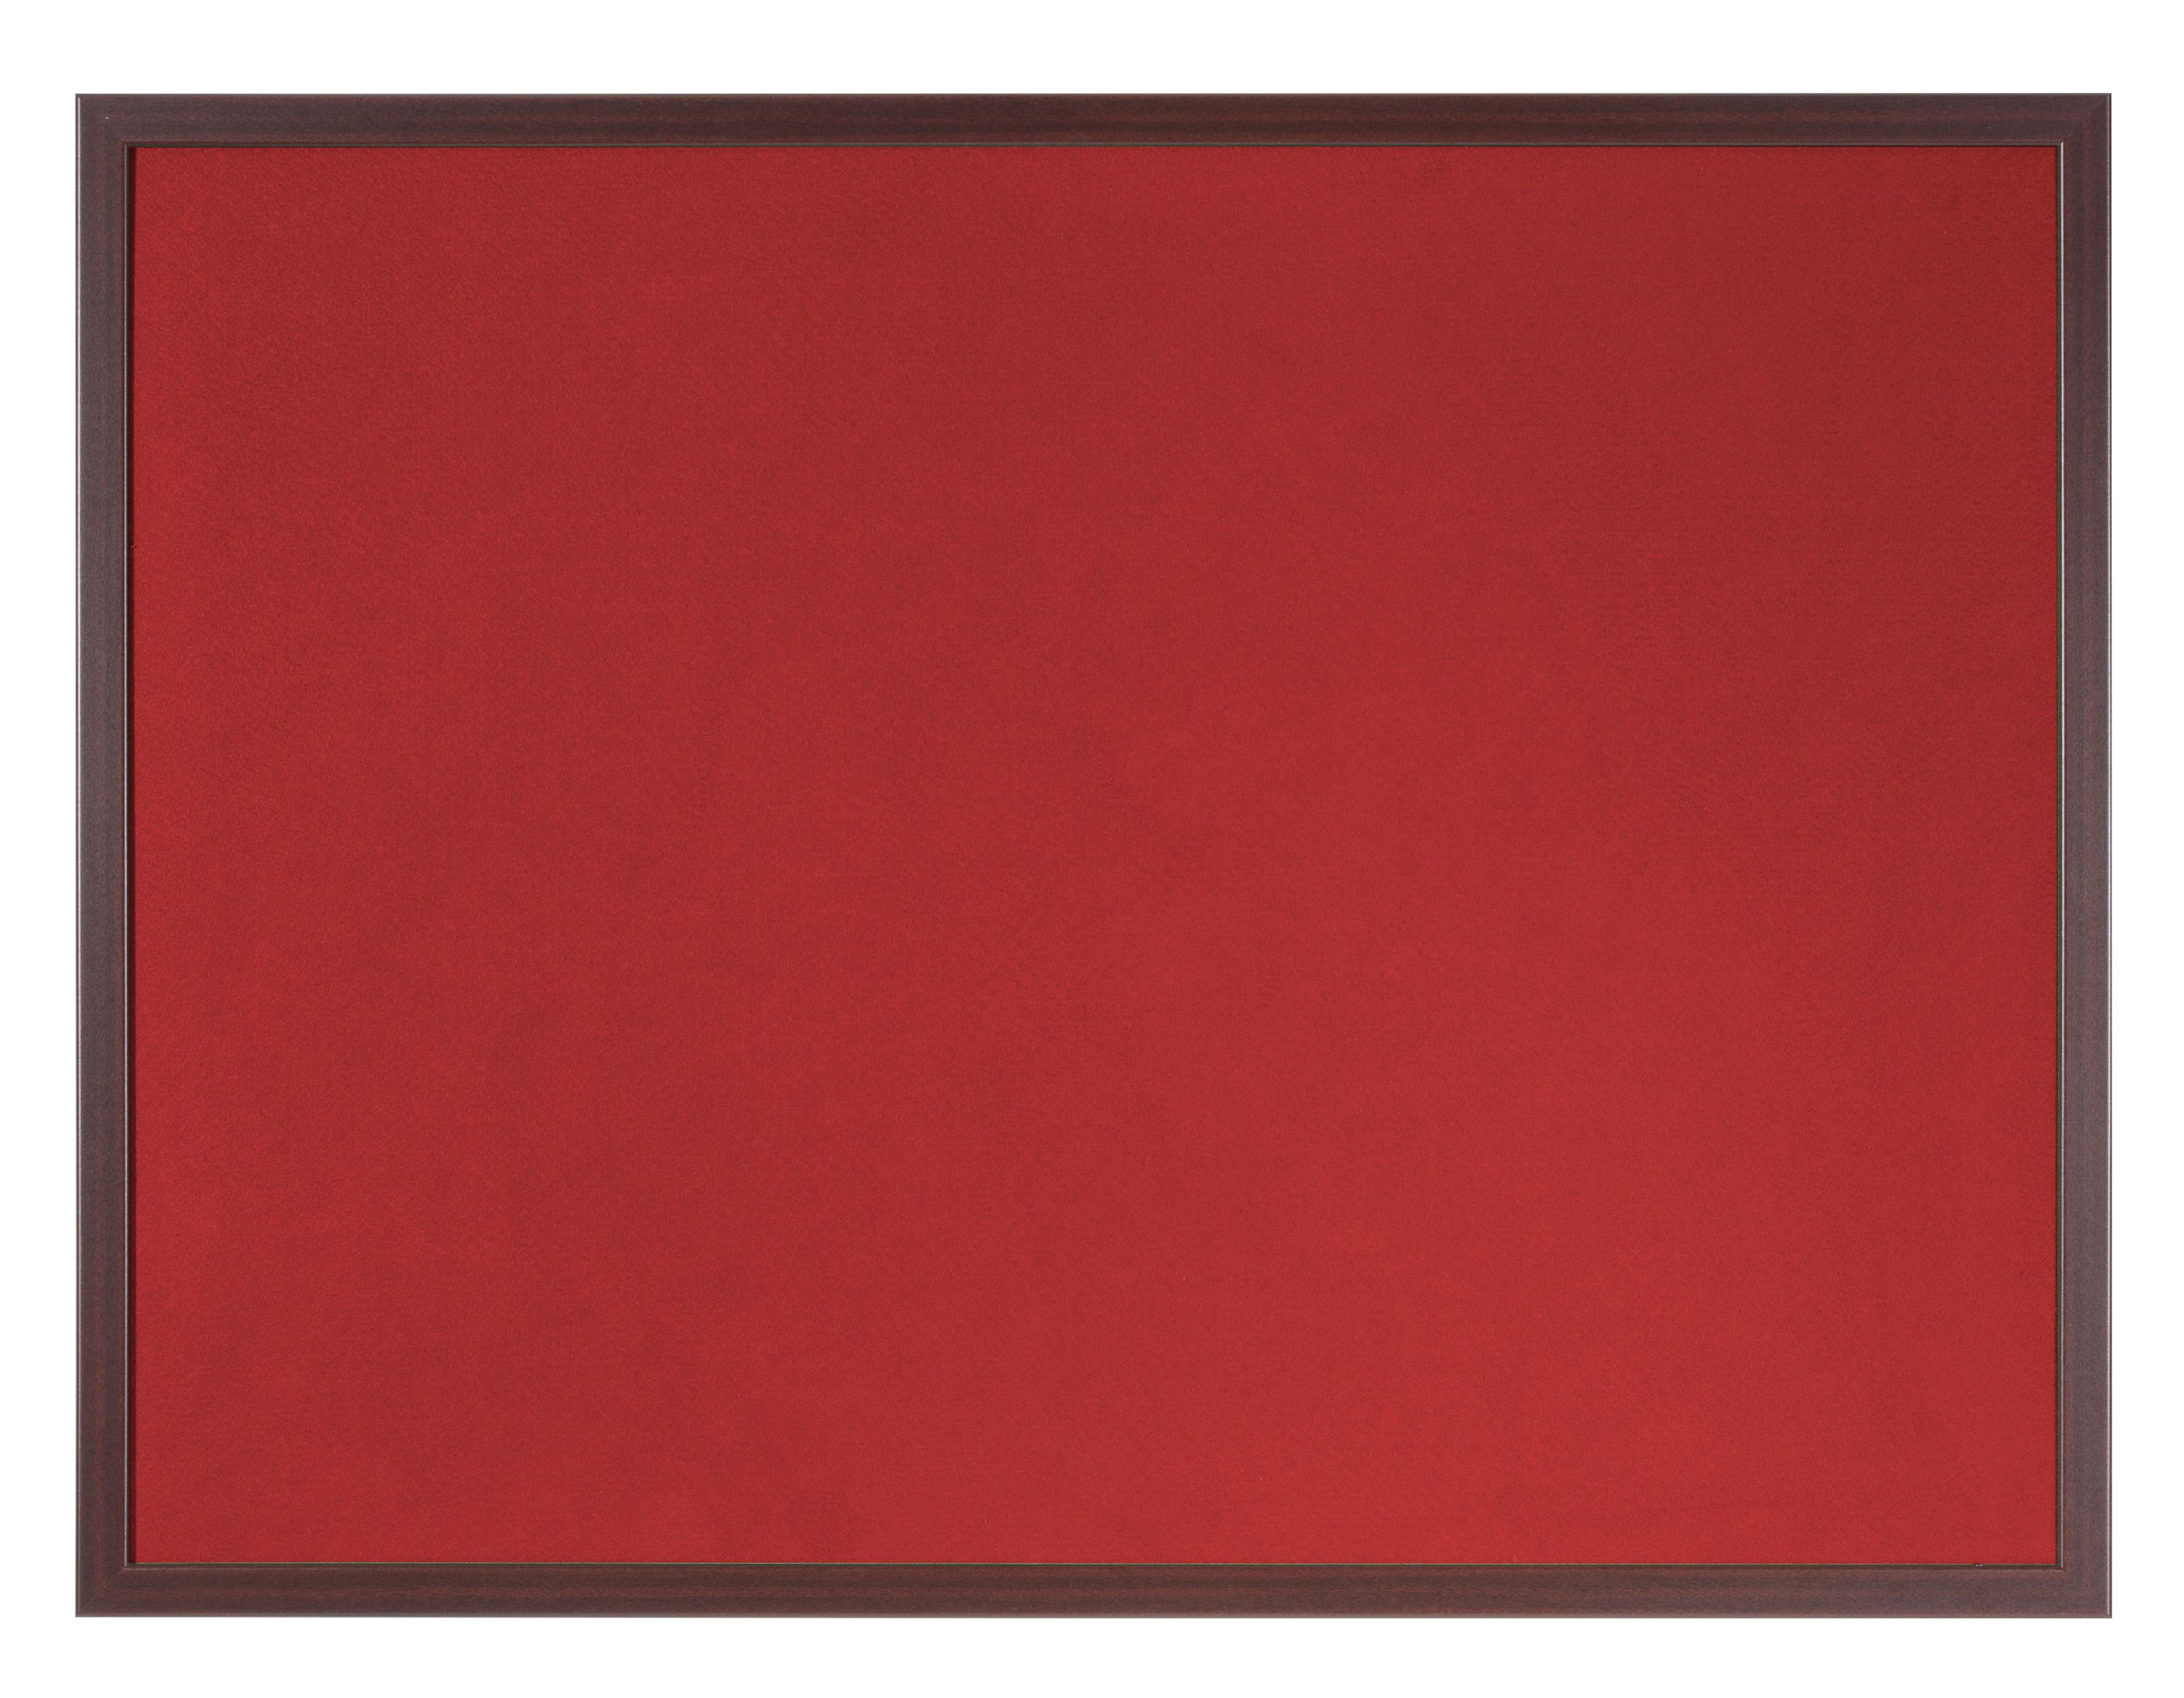 Felt Bi-Office Earth-It Red Felt Noticeboard Cherry Wood Frame 1200x900mm